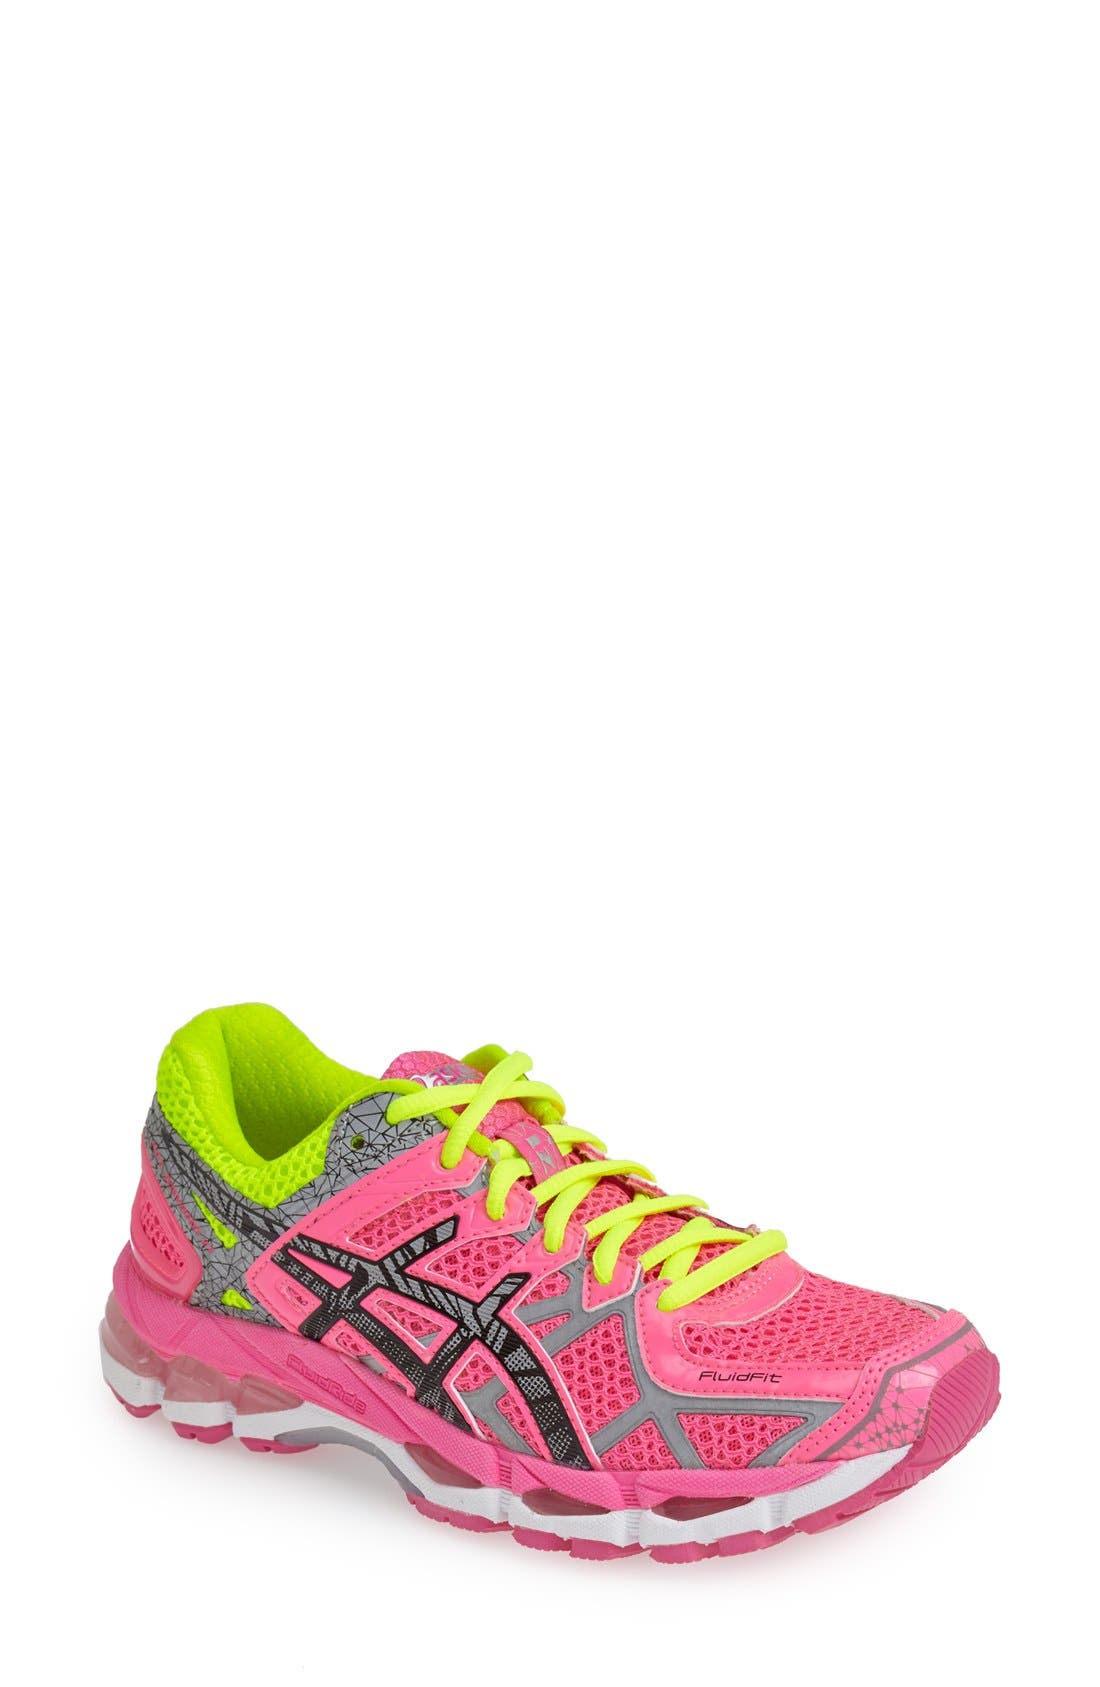 ASICS 'GEL-Kayano<sup>®</sup> 21' Running Shoe,                             Main thumbnail 1, color,